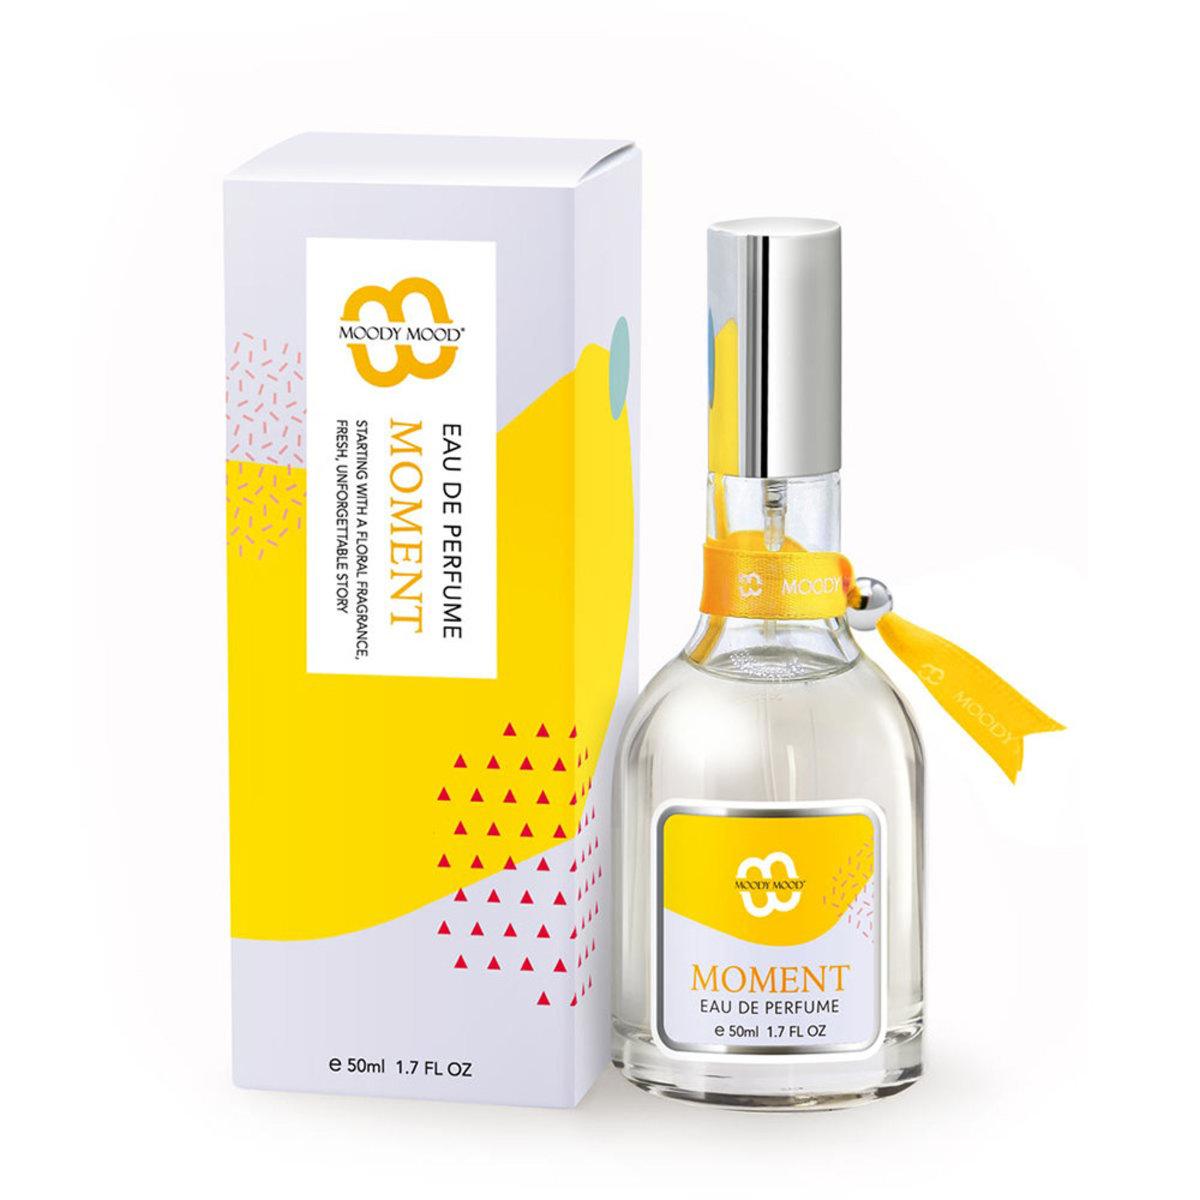 Moment - 韓國費洛蒙香水50ml (蘋果蜜桃味)